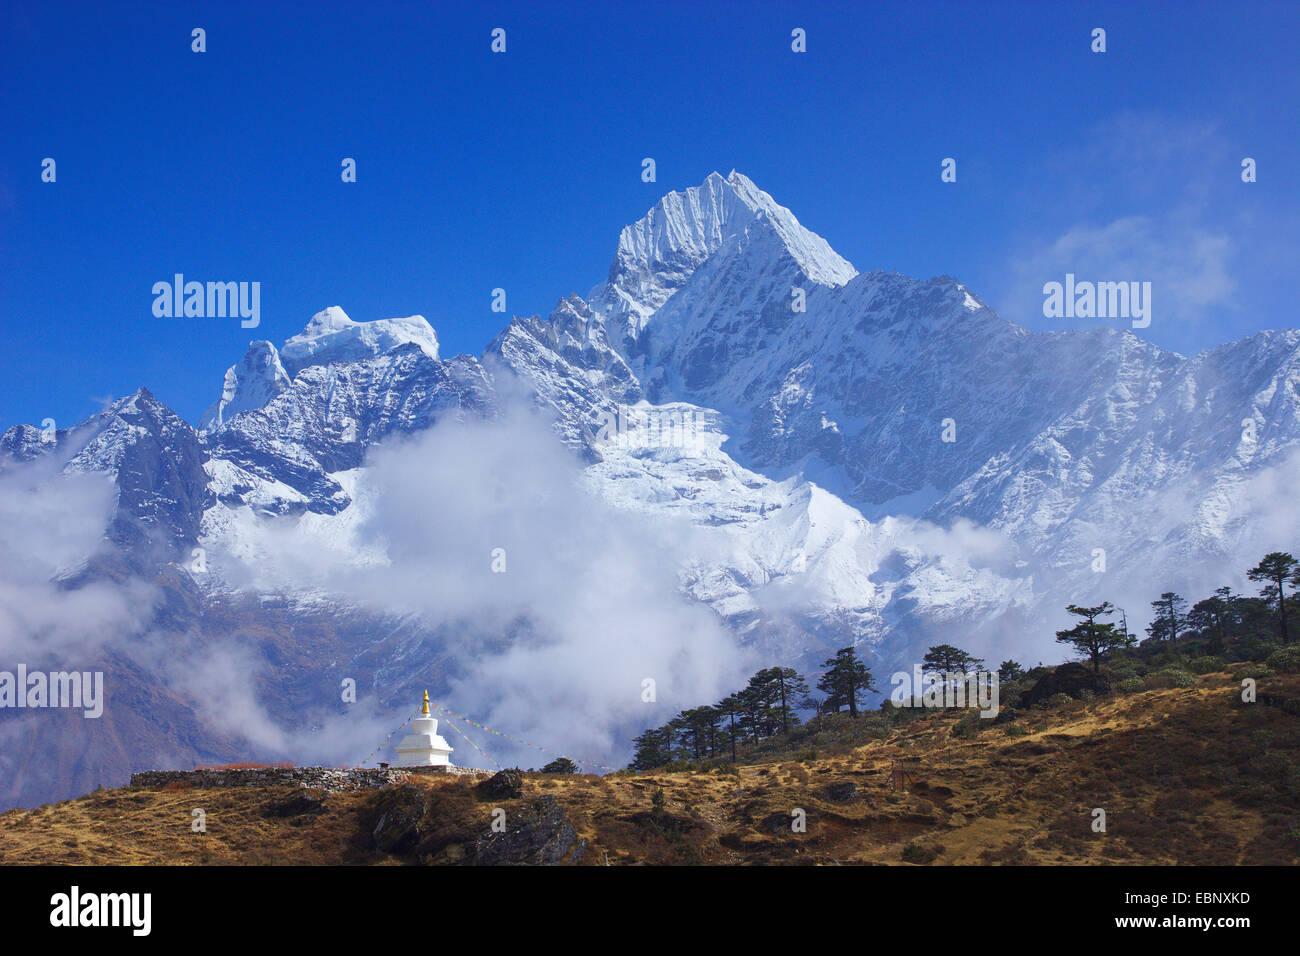 Thamserku, view from above Khumjung, Nepal, Khumbu Himal - Stock Image